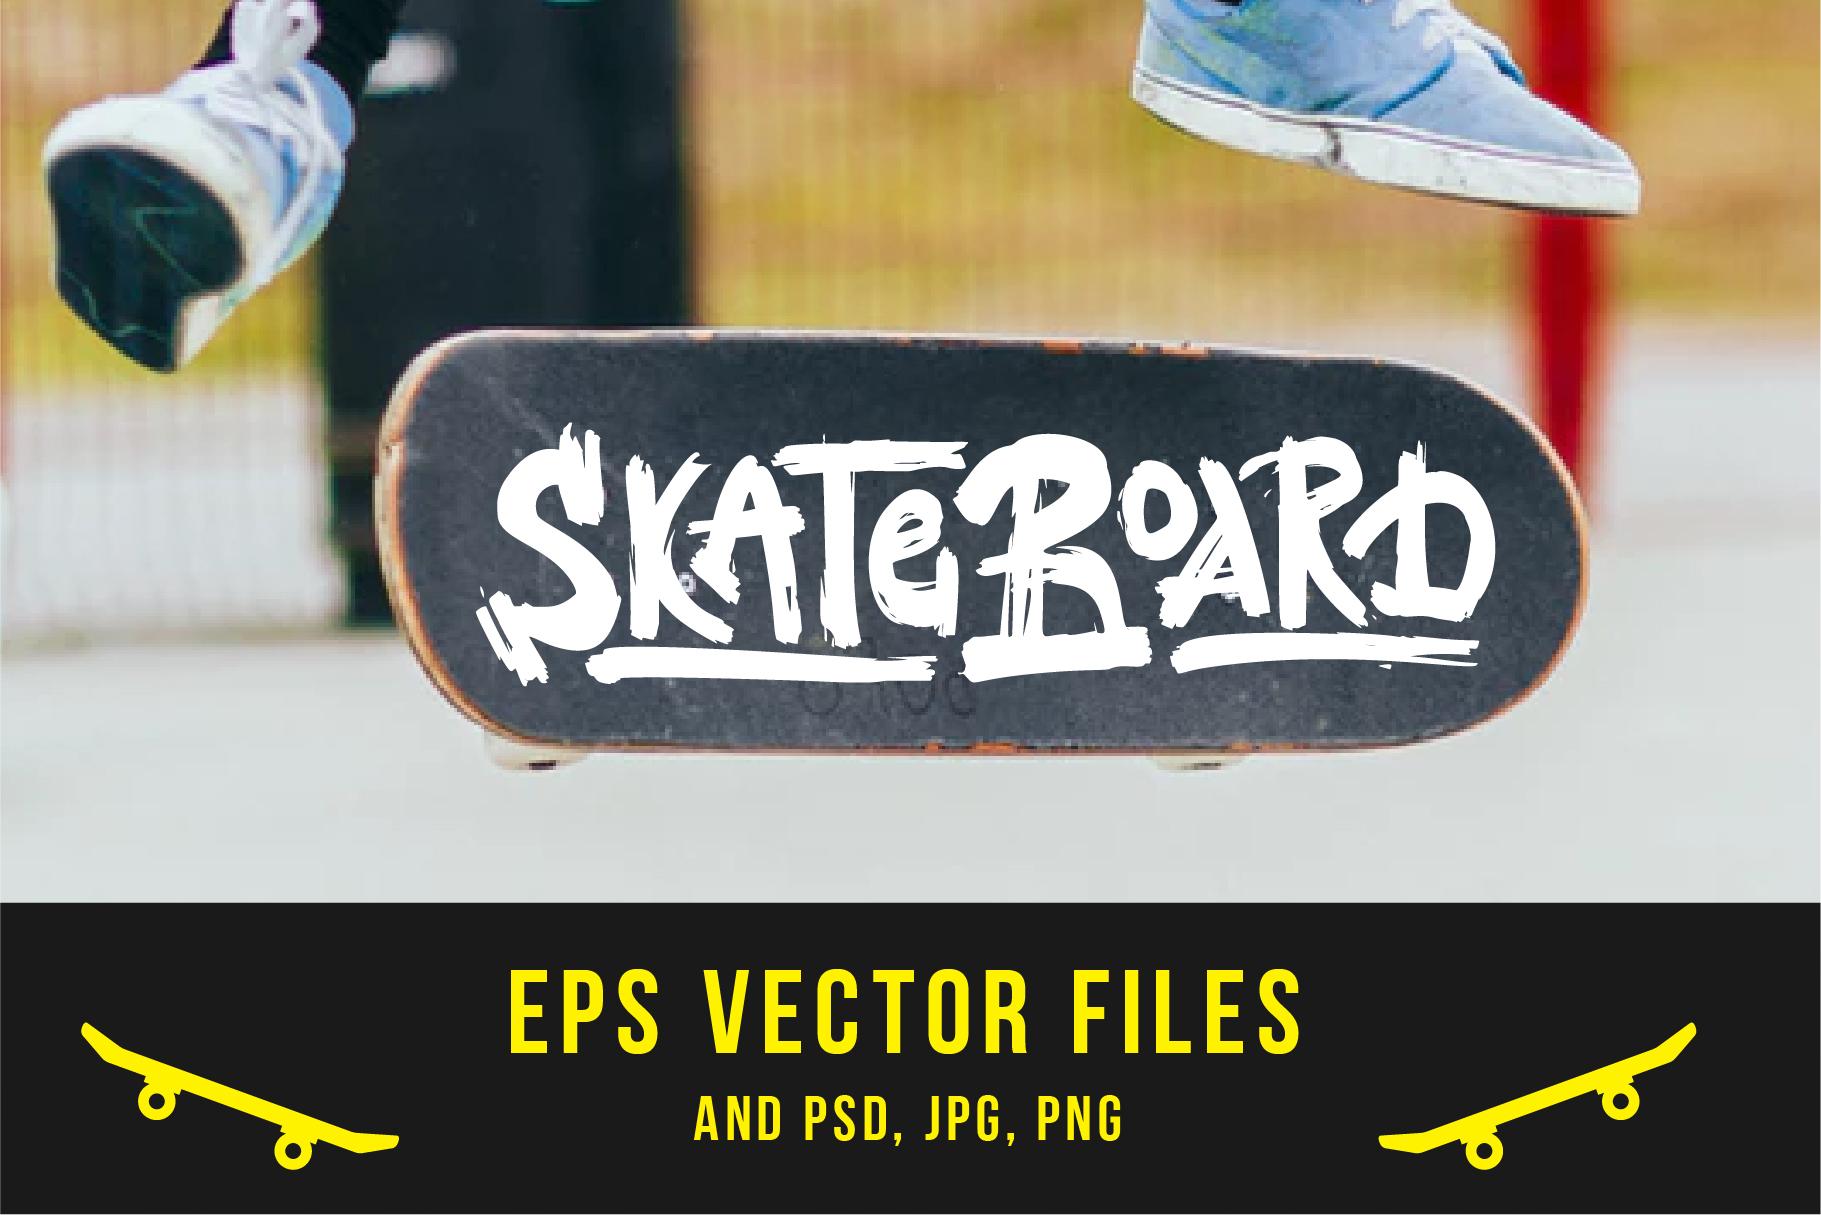 Skateboarding t-shirt design example image 4